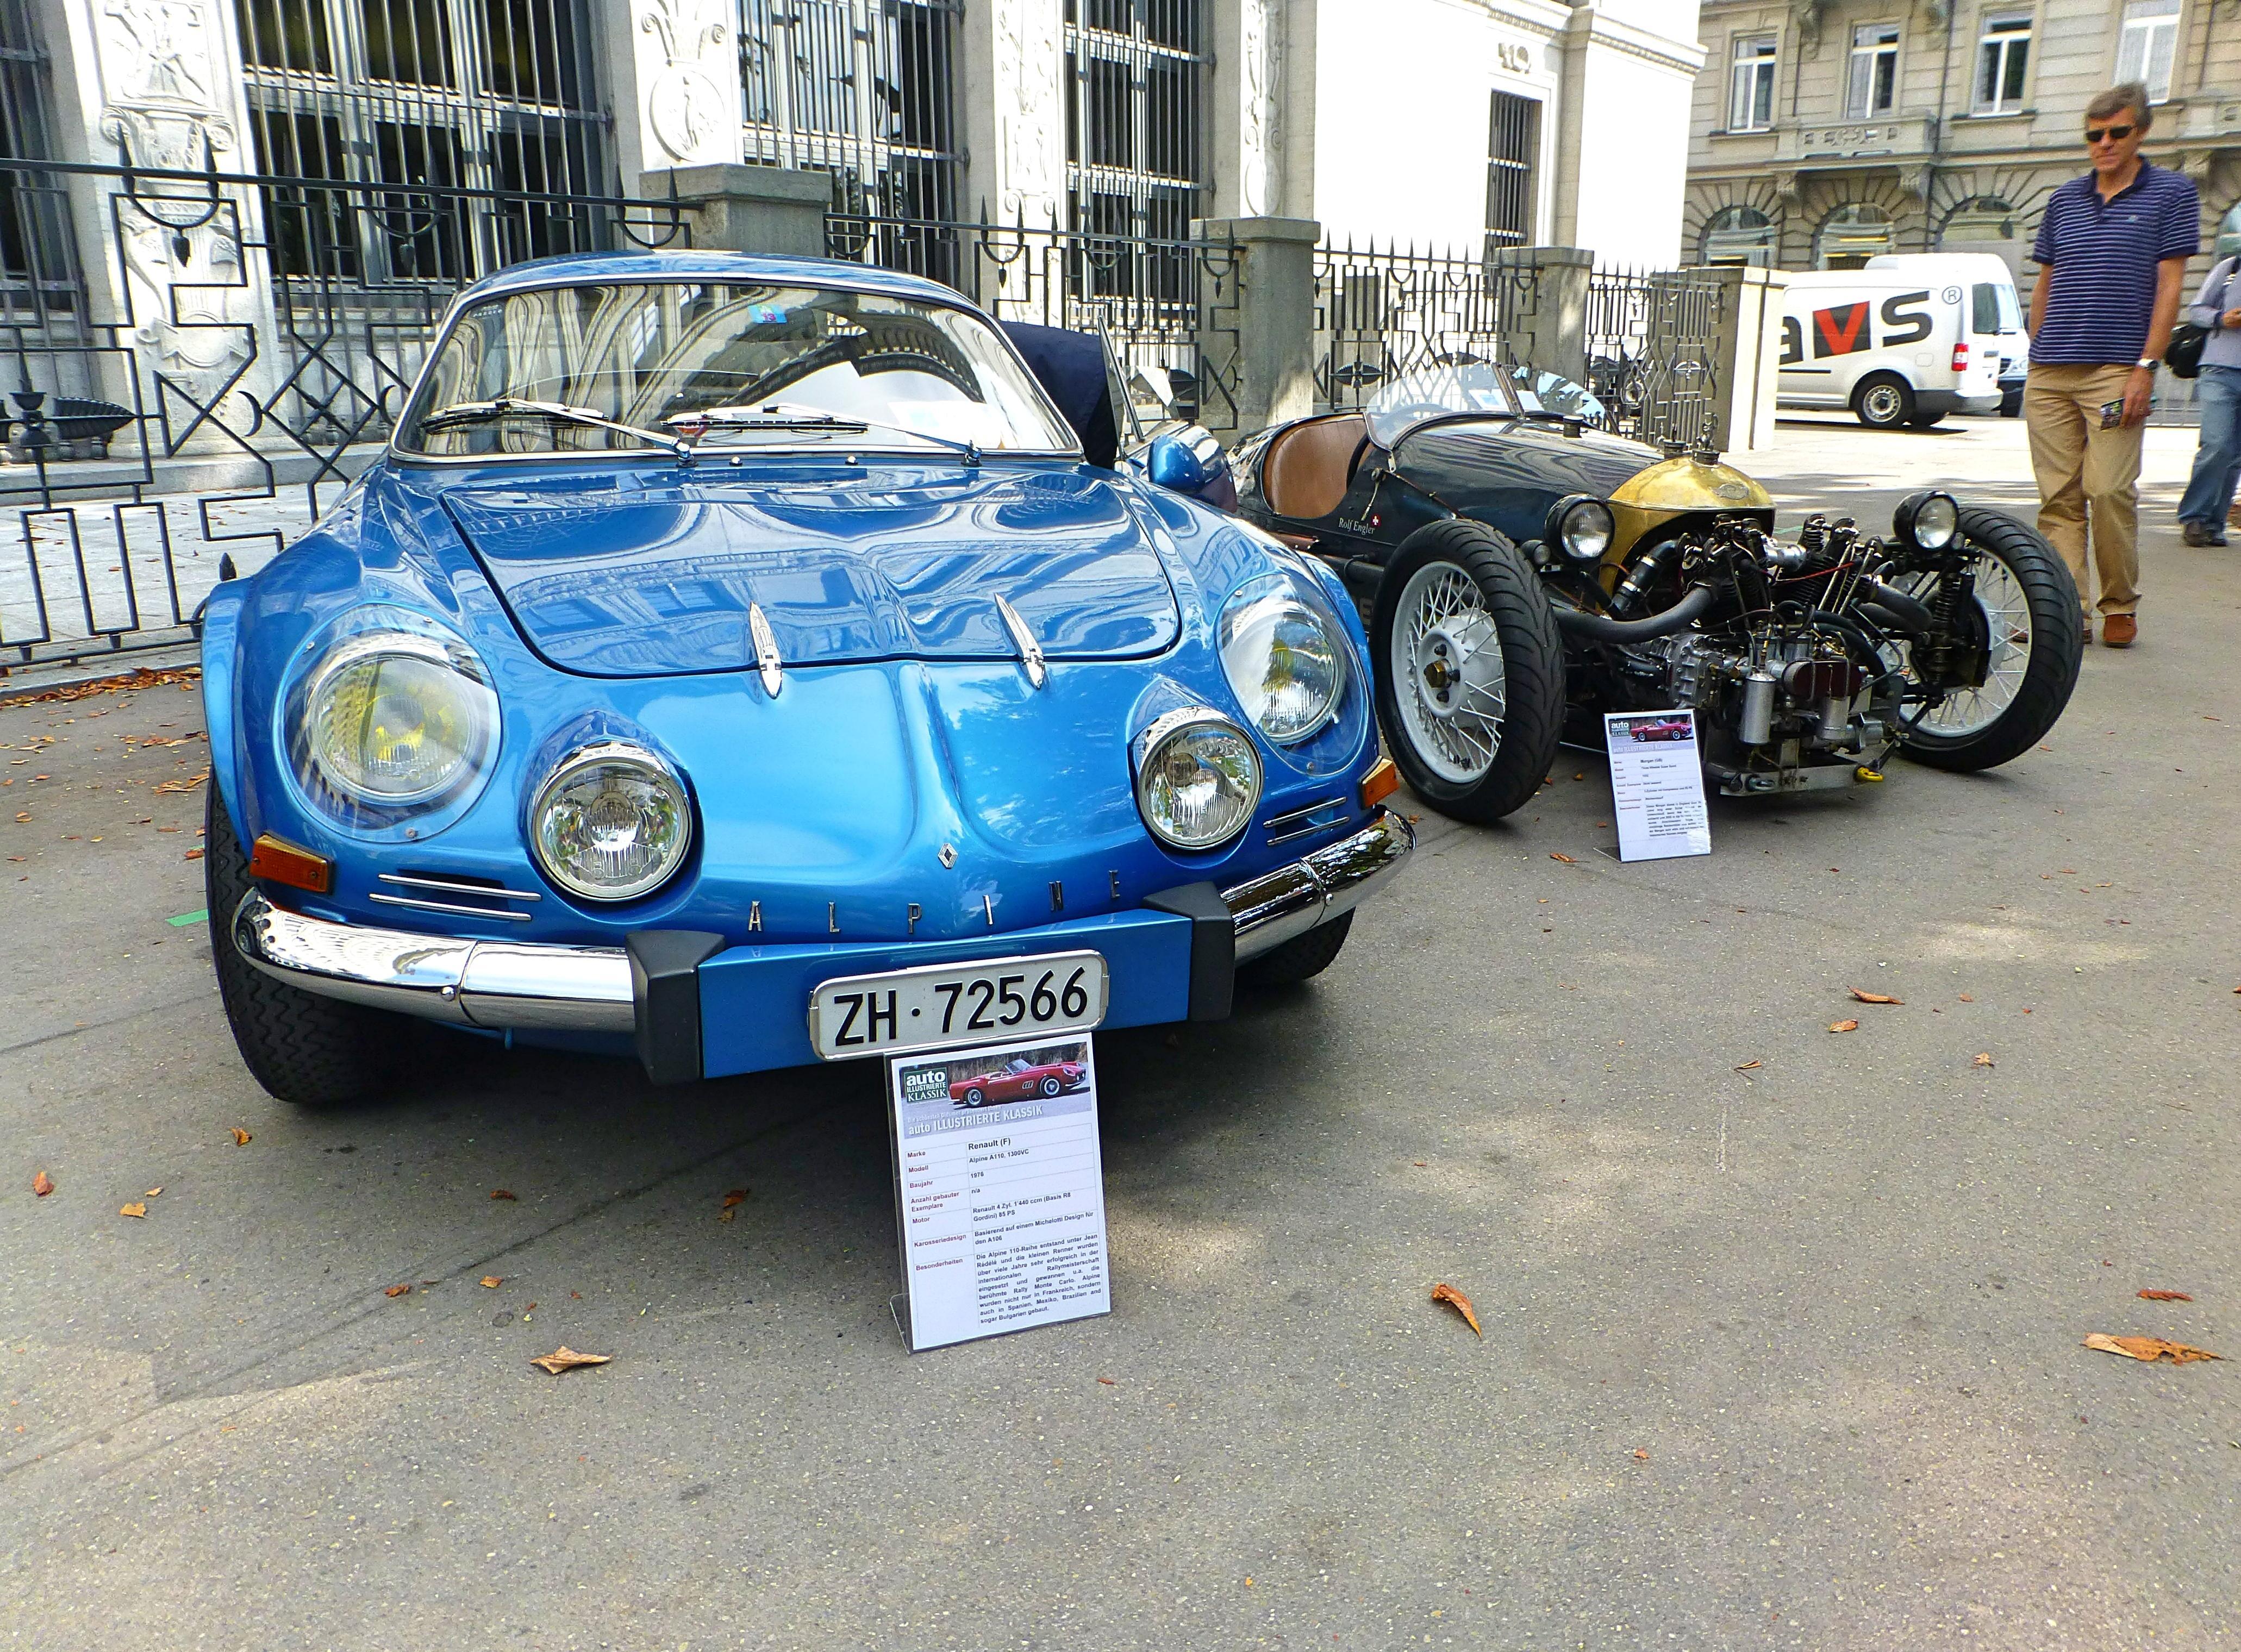 Zurich Classic Car Award 2013 (47)